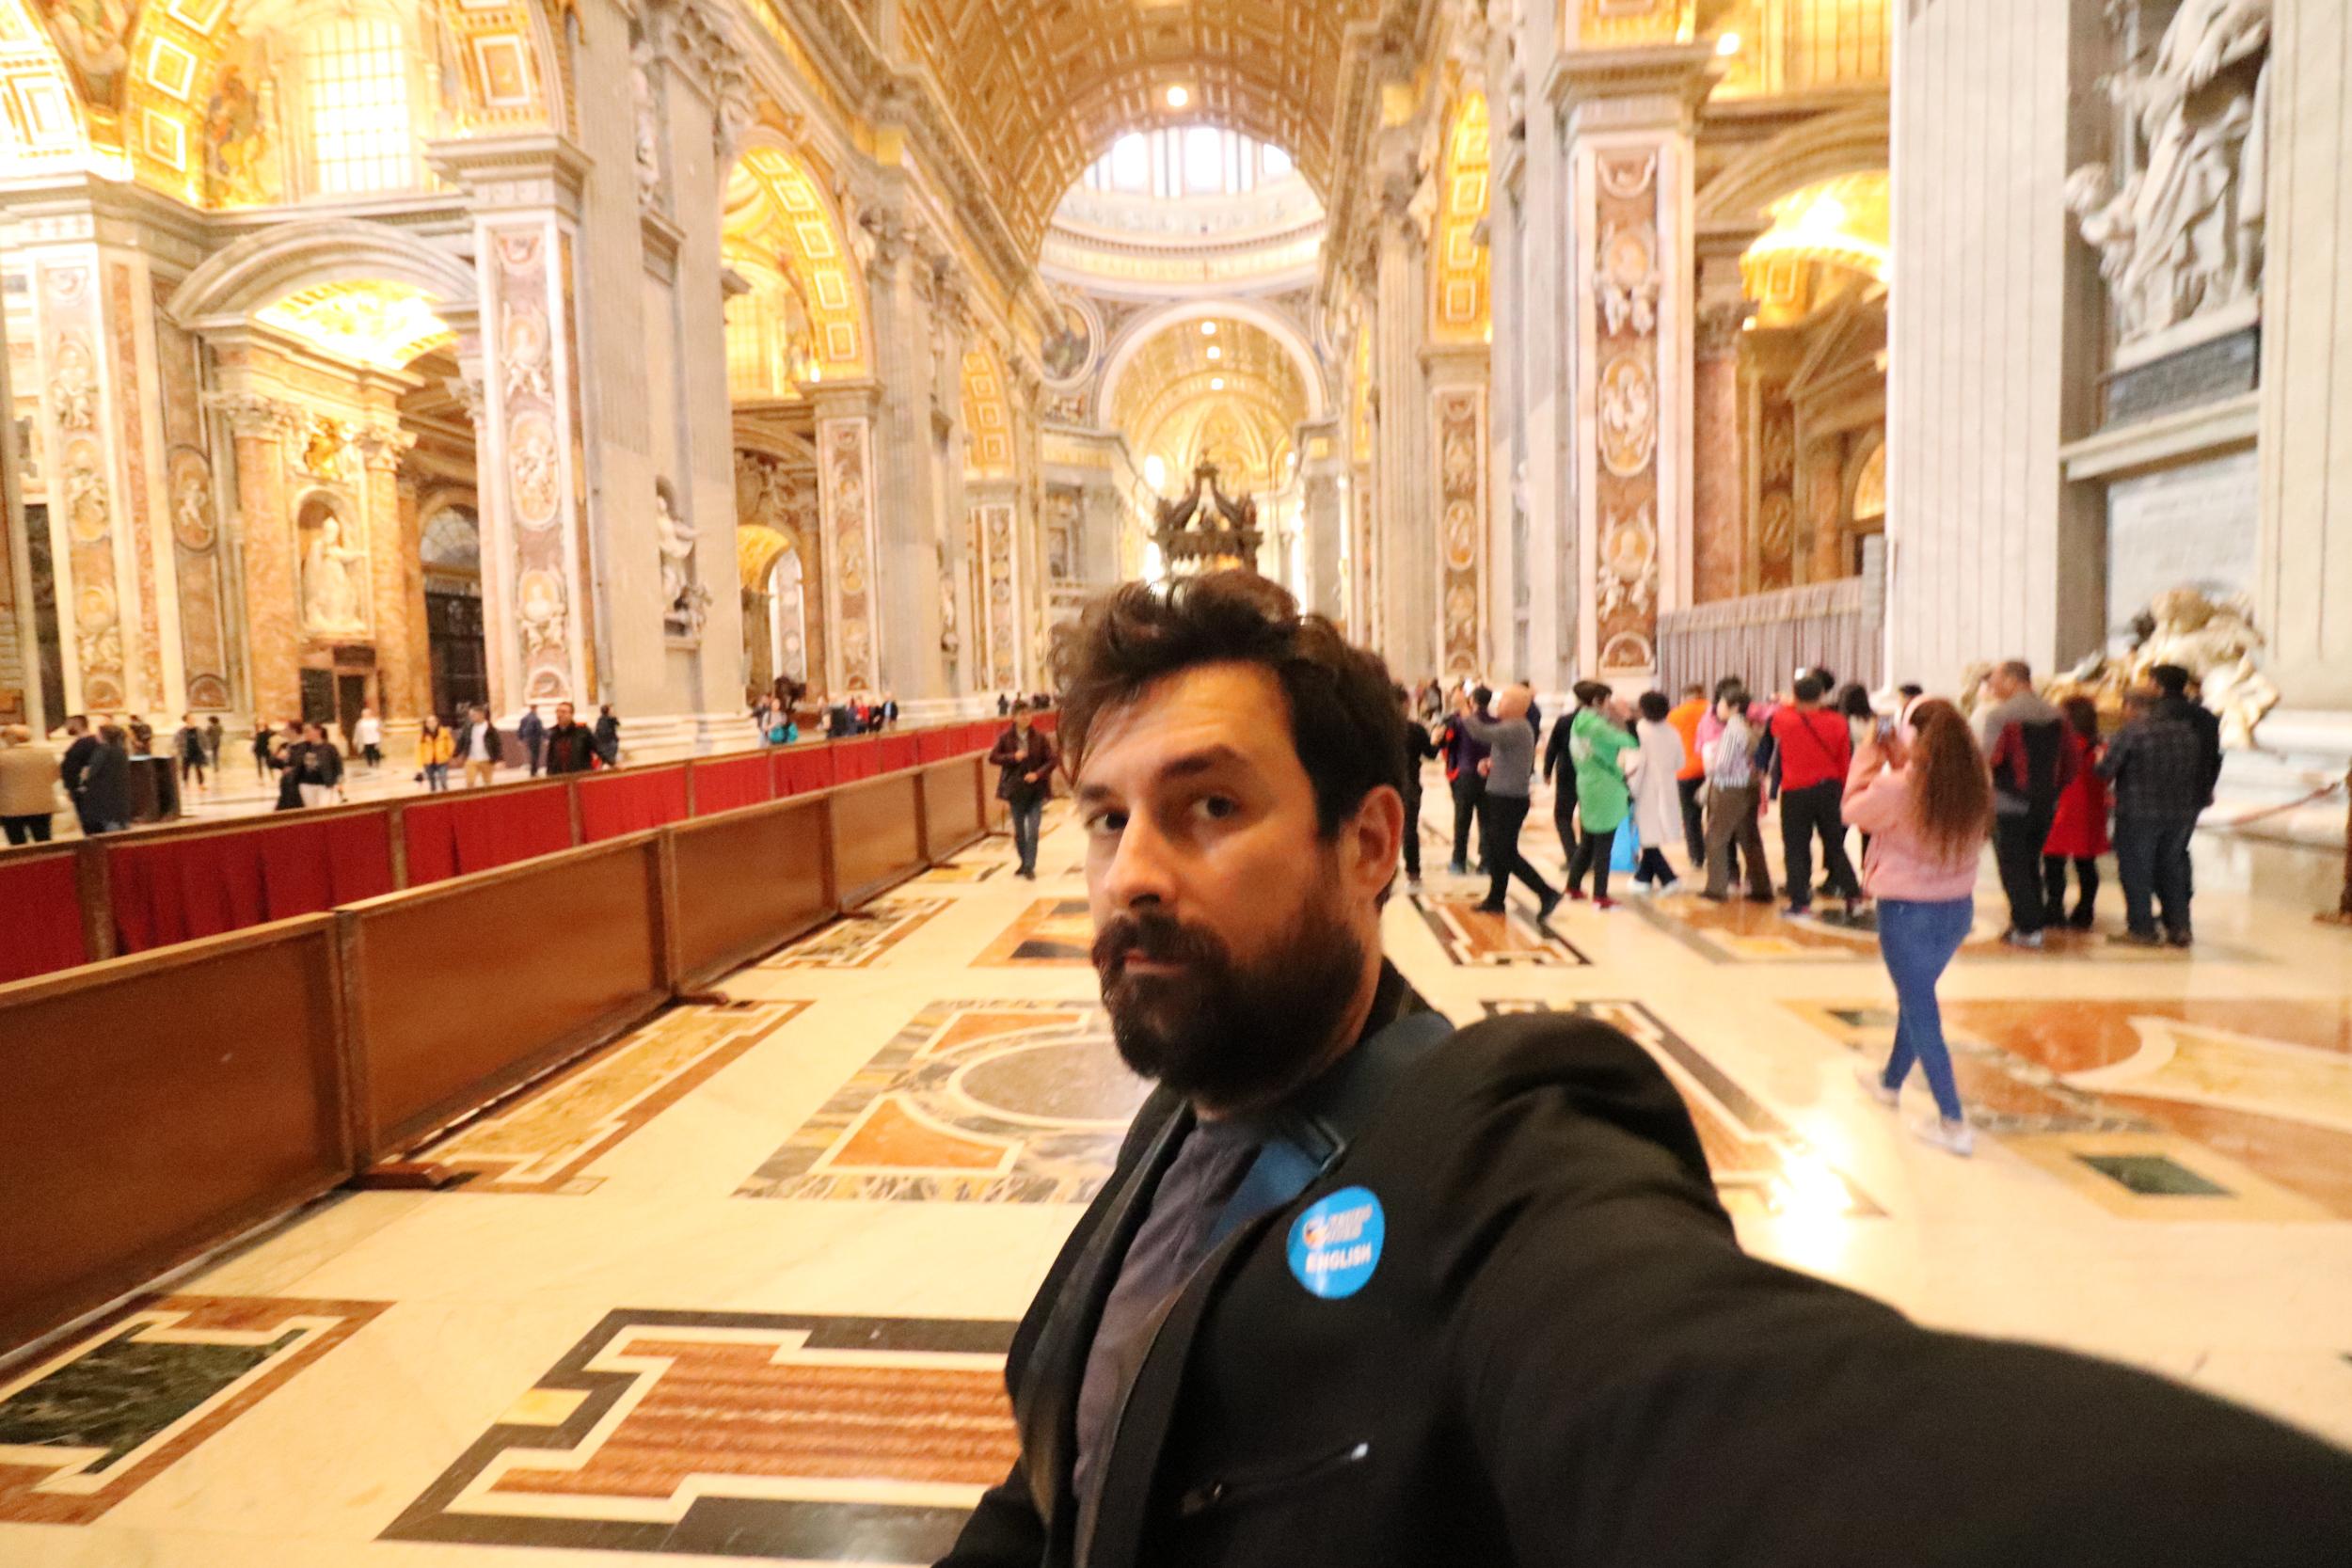 Hall in the Vatican Halls